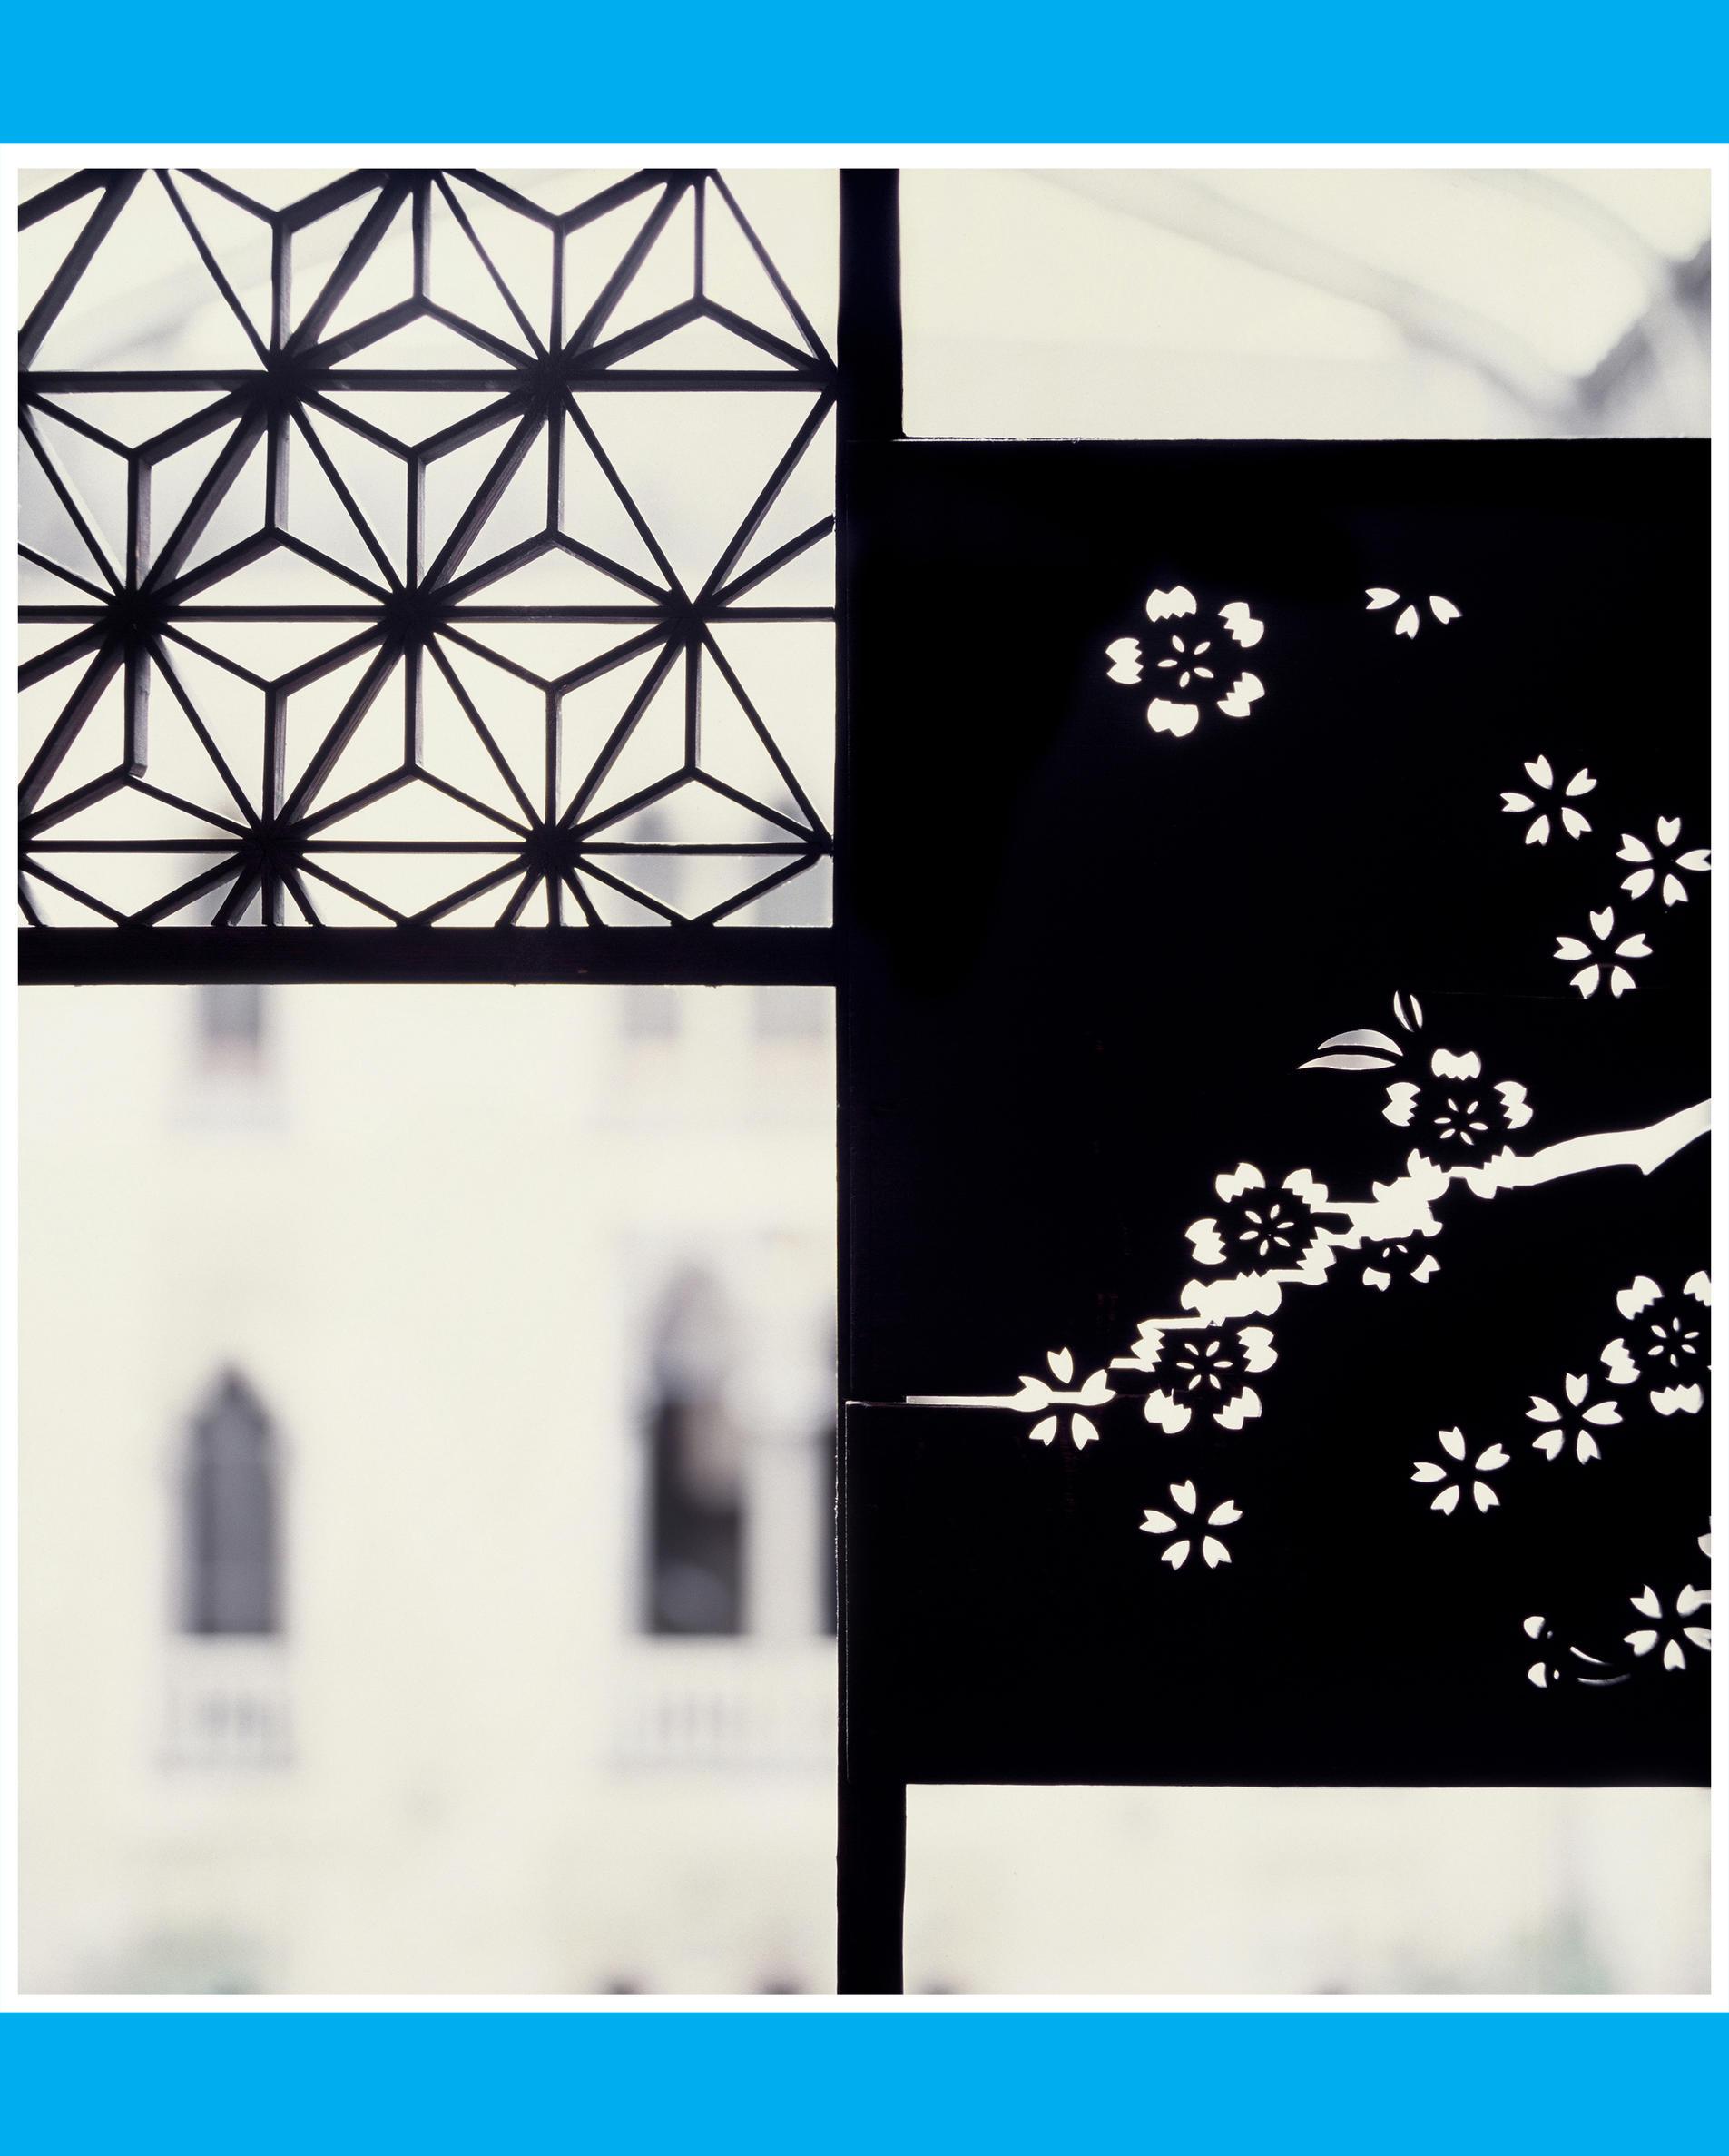 Luisa Lambri, Untitled (Isabella Stewart Gardner Museum #07), 2008, 78 x 65.86 cm